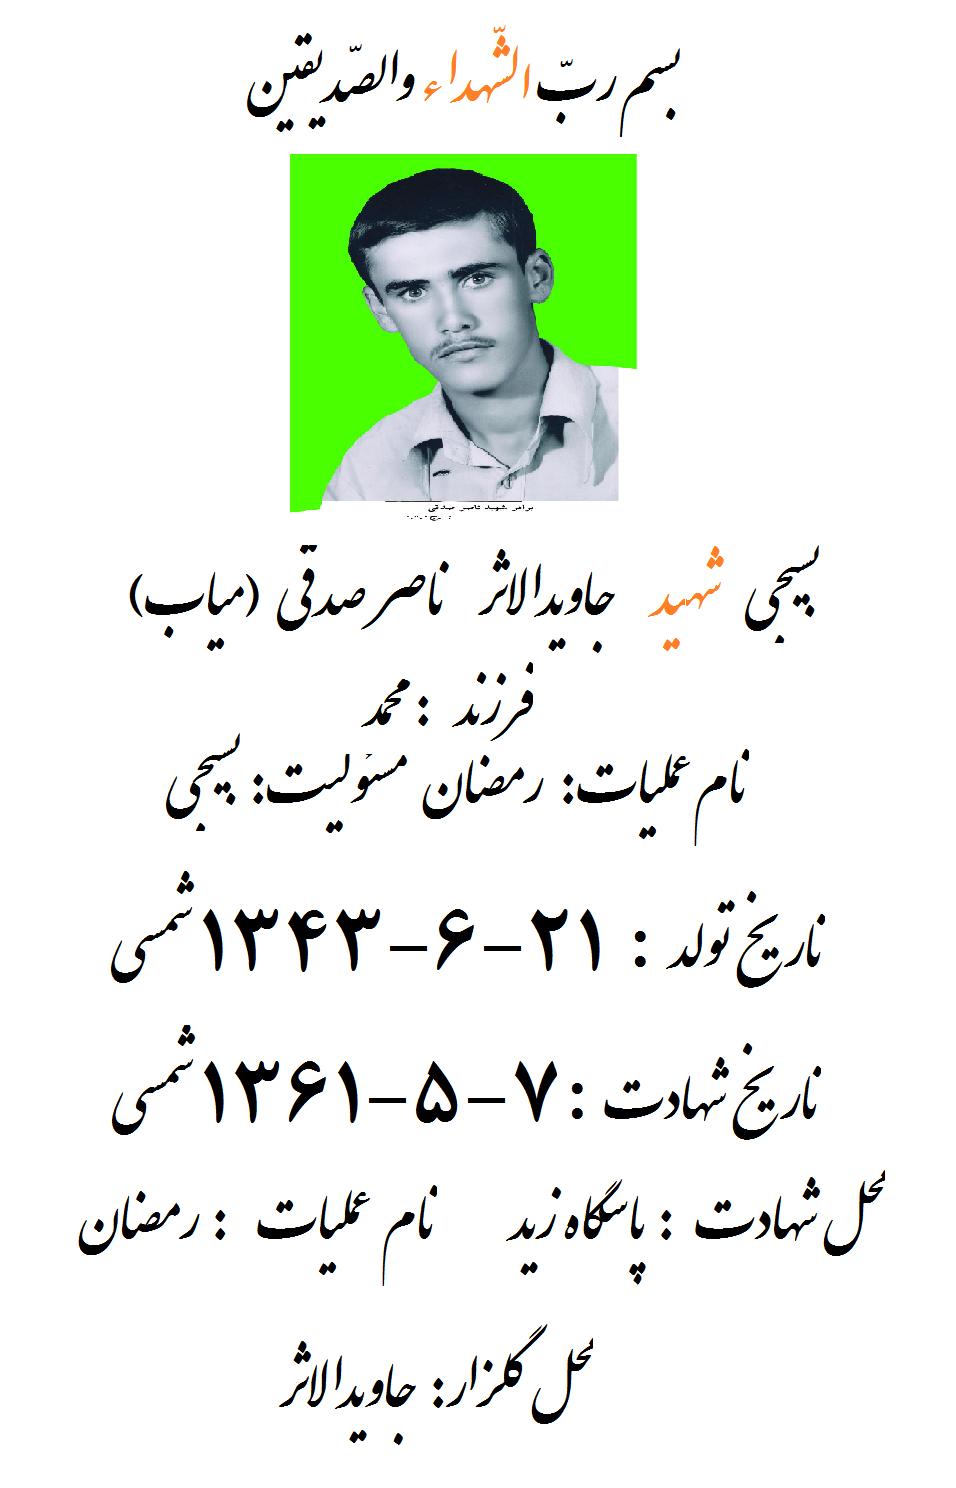 شهید ناصرصدقی